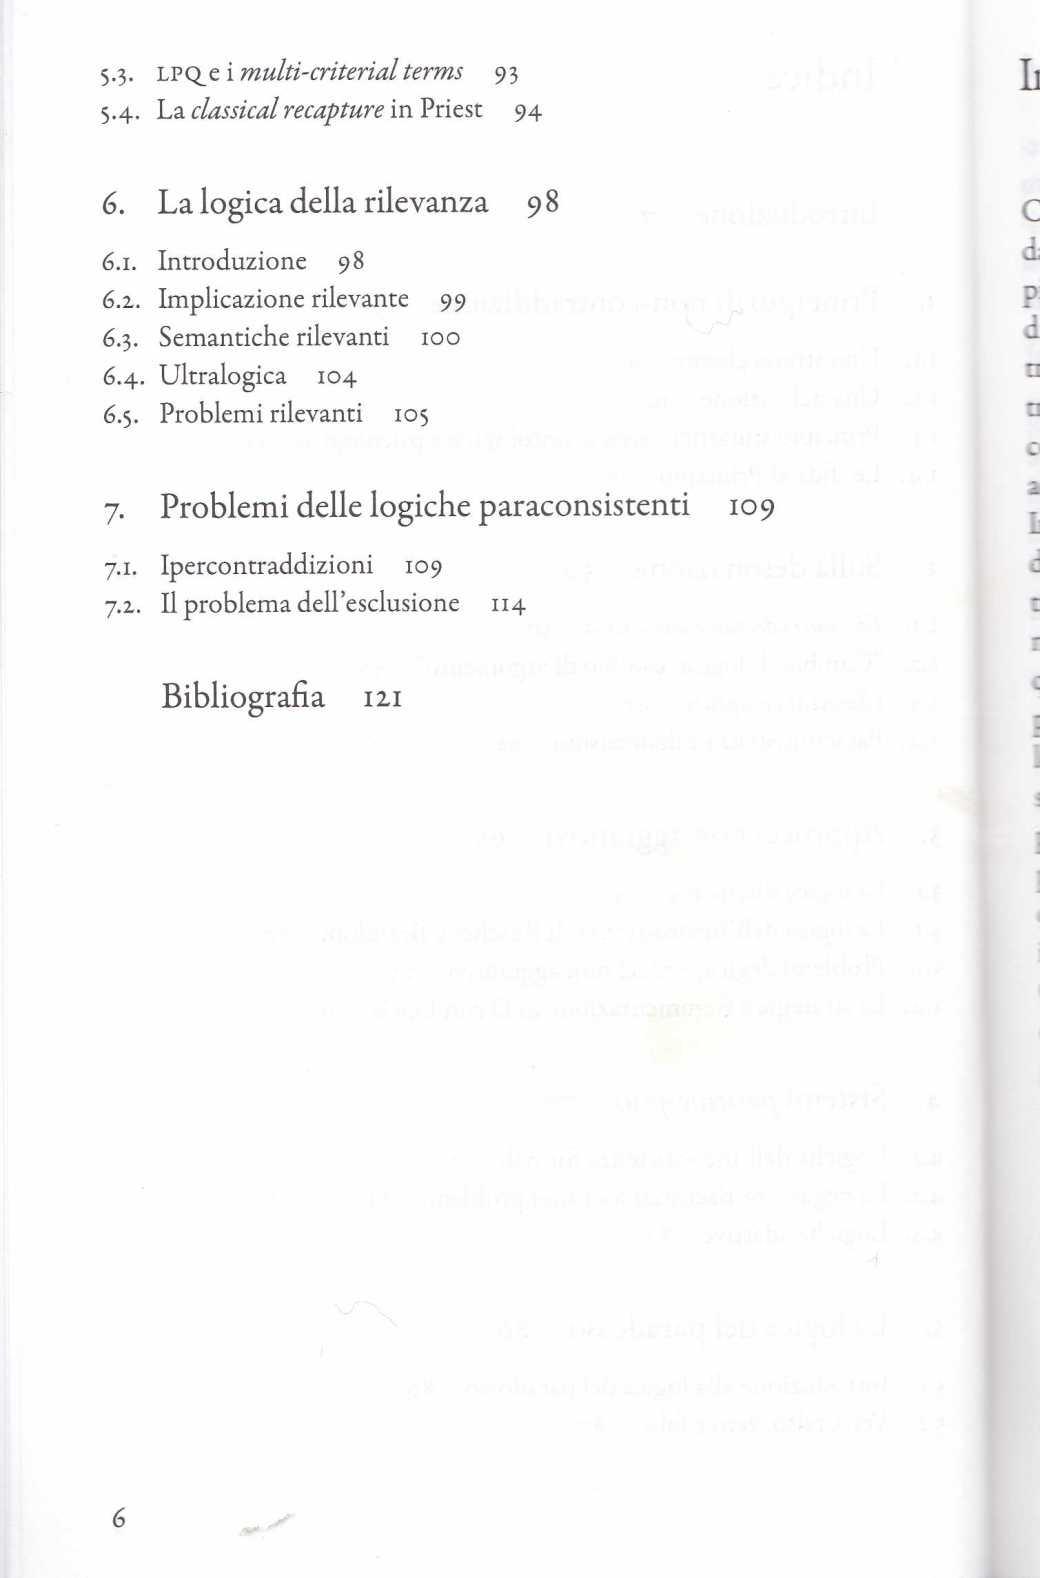 libri emanuele sevrino1919